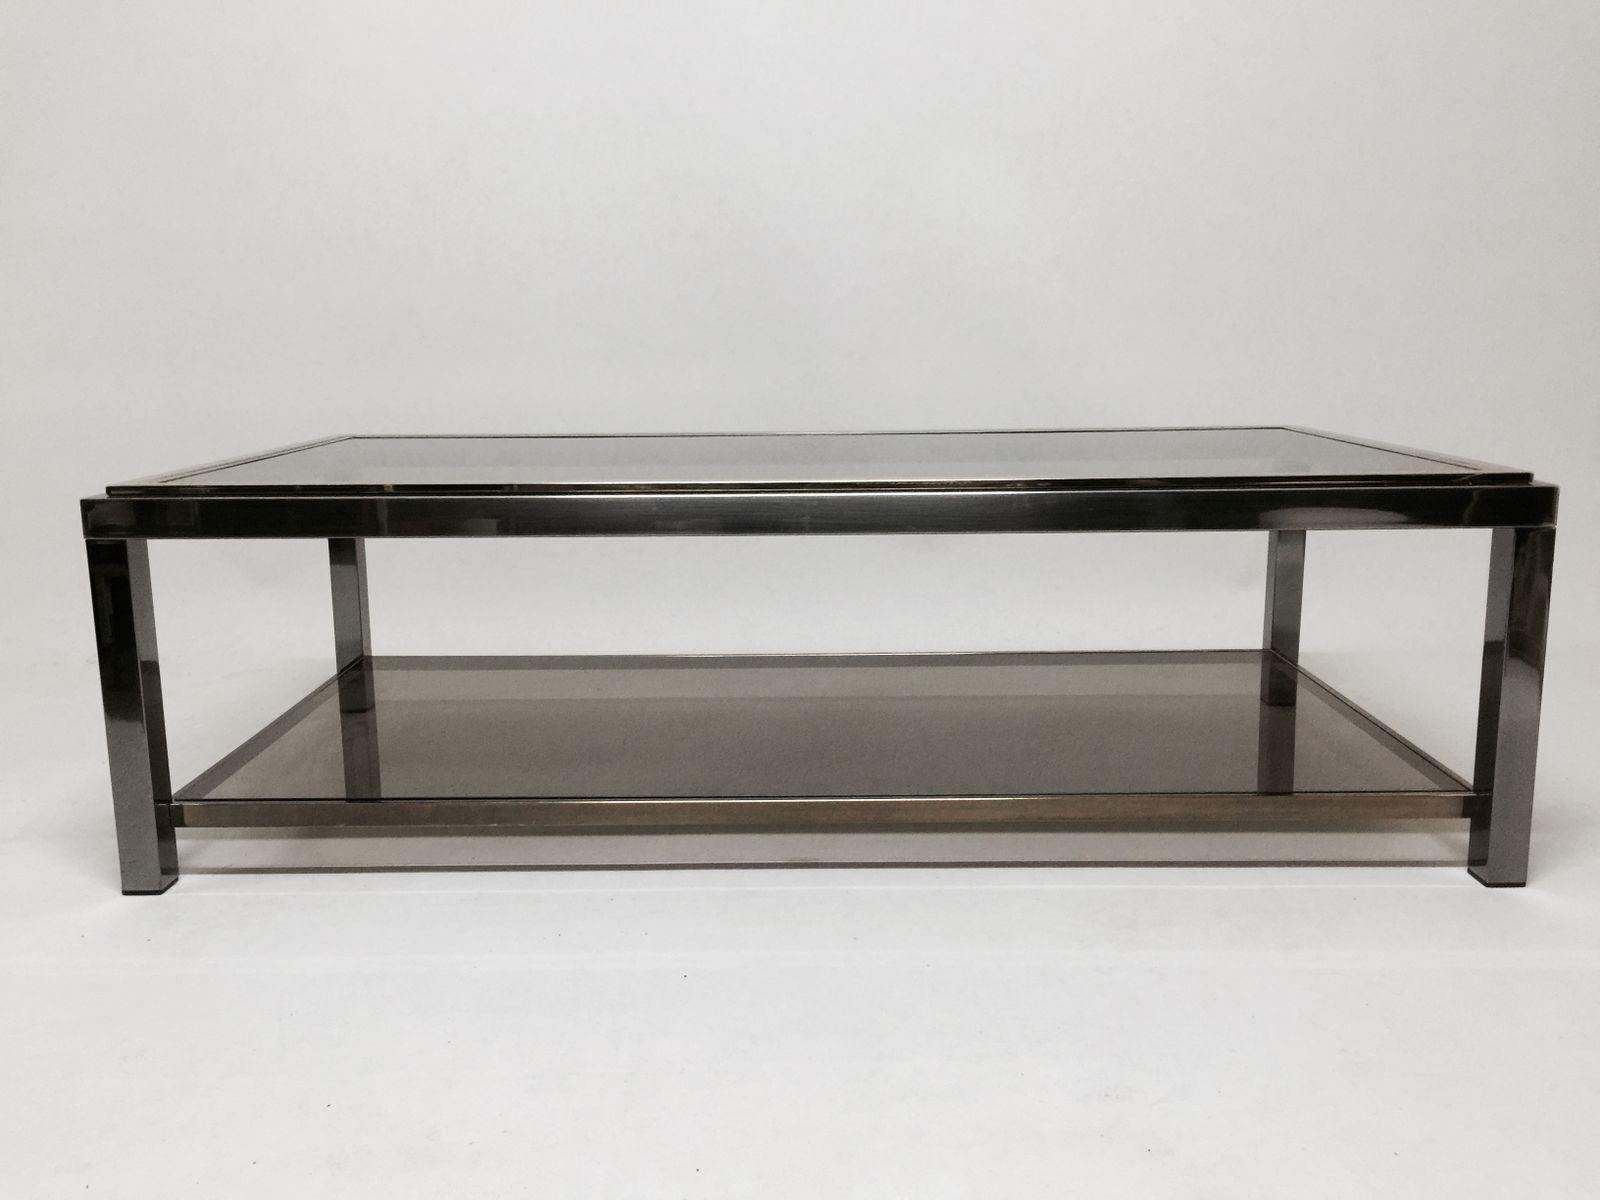 Table basse de roche bobois france 1970s en vente sur pamono for Roche bobois table basse